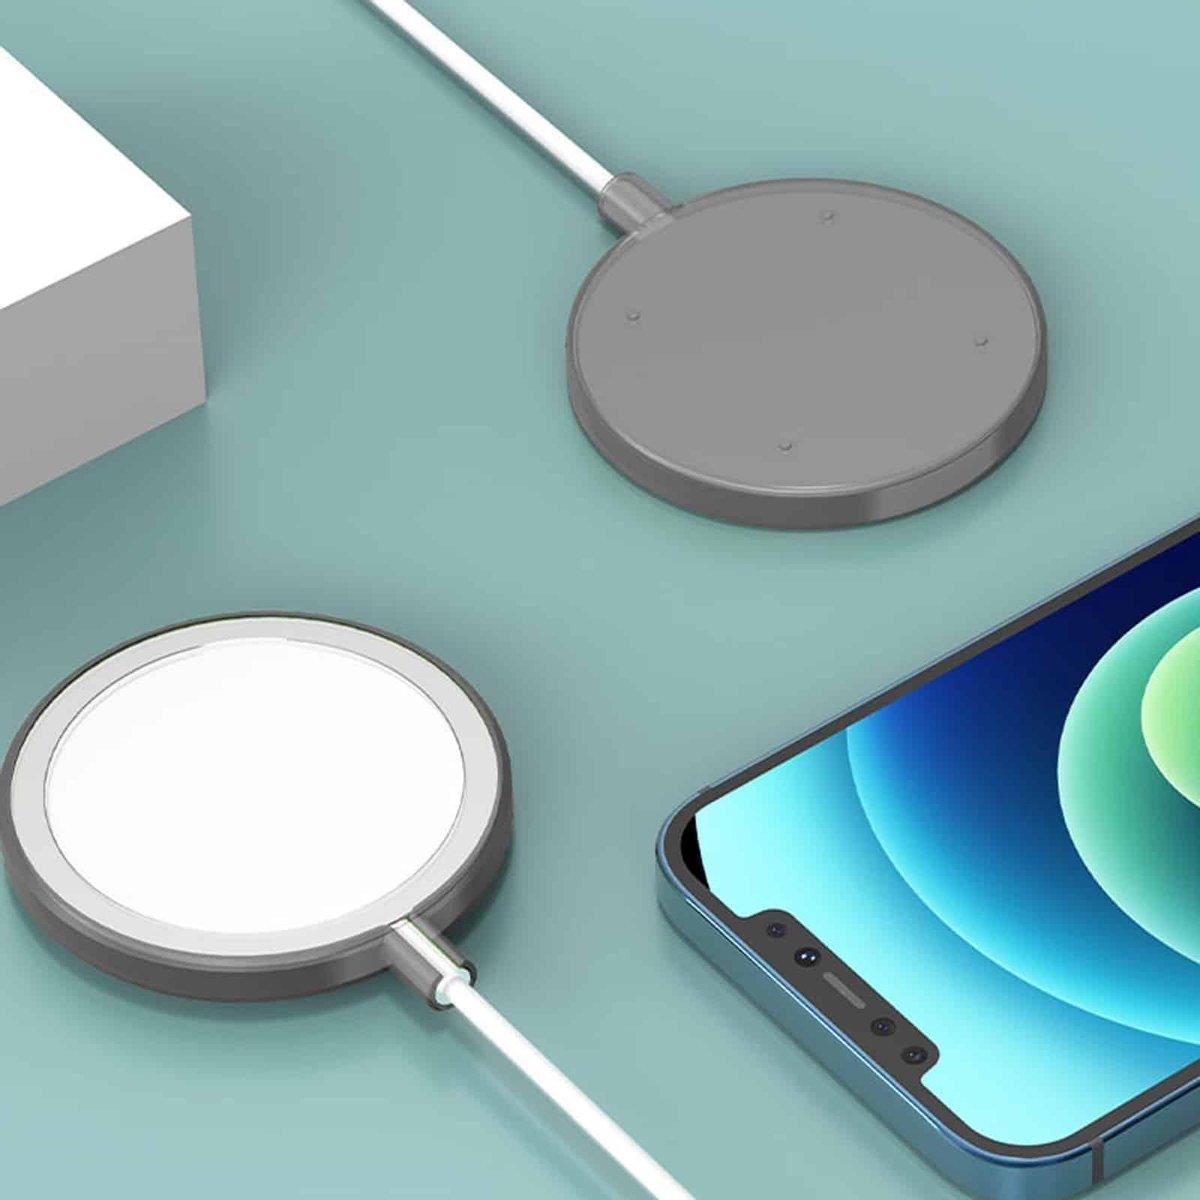 Schokbestendige siliconen + TPU beschermhoes voor iPhone 12 Pro Max MagSafe draadloze oplader (zwart)